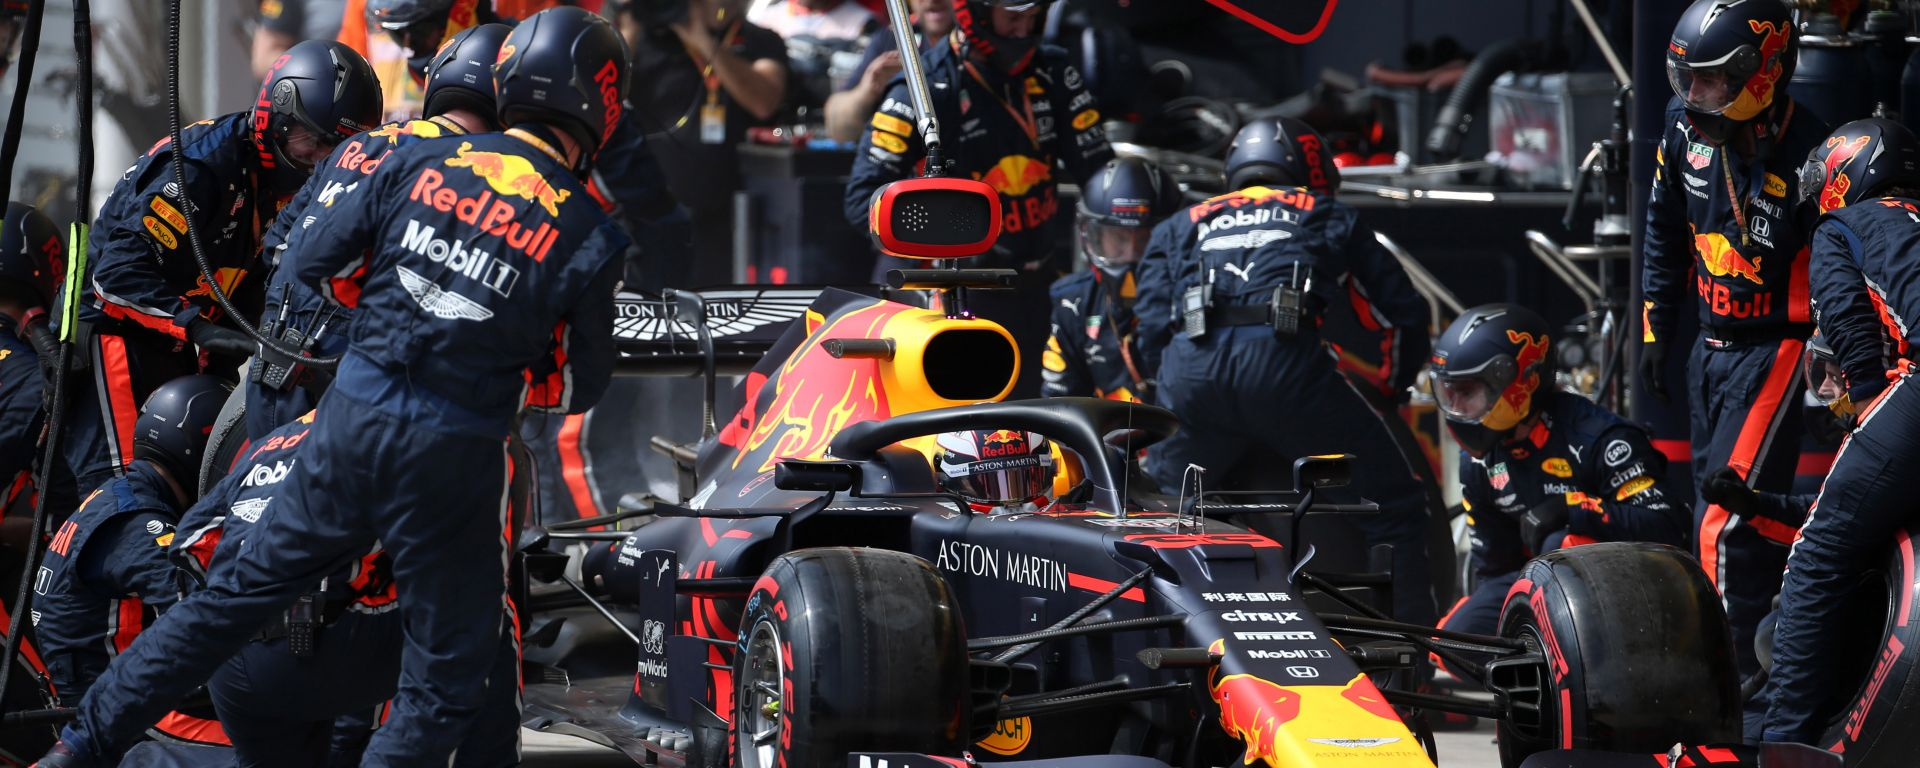 F1 GP Brasile 2019, Interlagos. Max Verstappen (Red Bull)